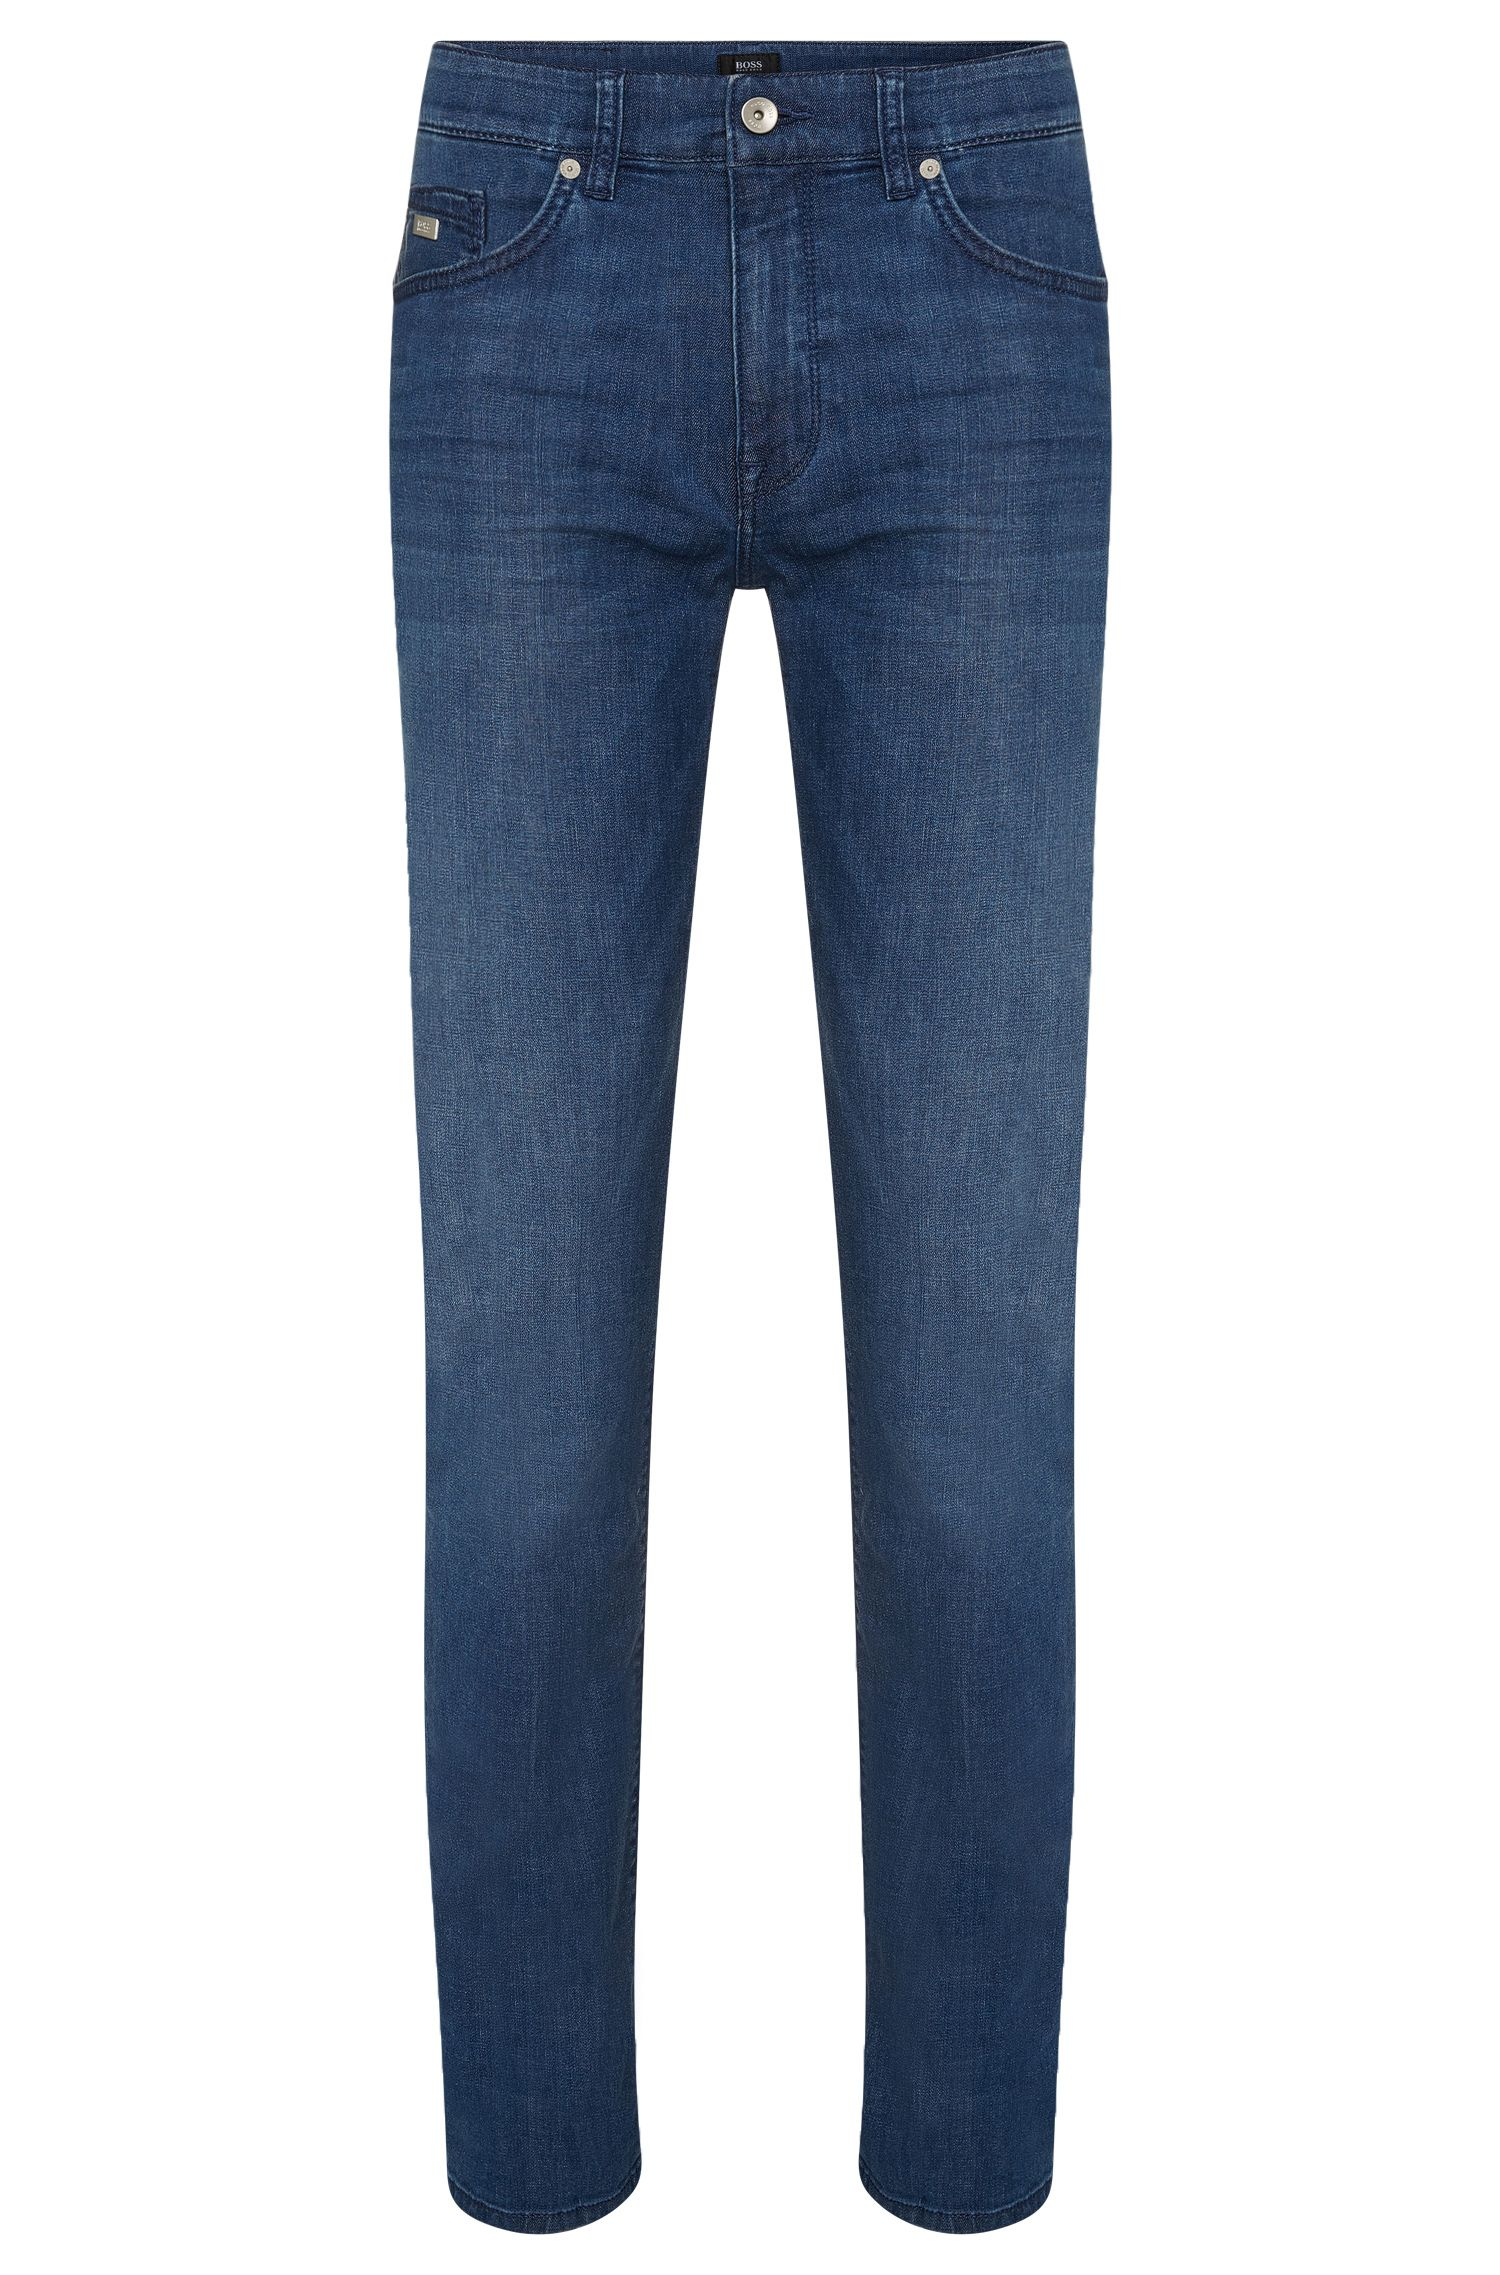 'Maine'   Regular Fit, 8 oz Stretch Cotton Jeans